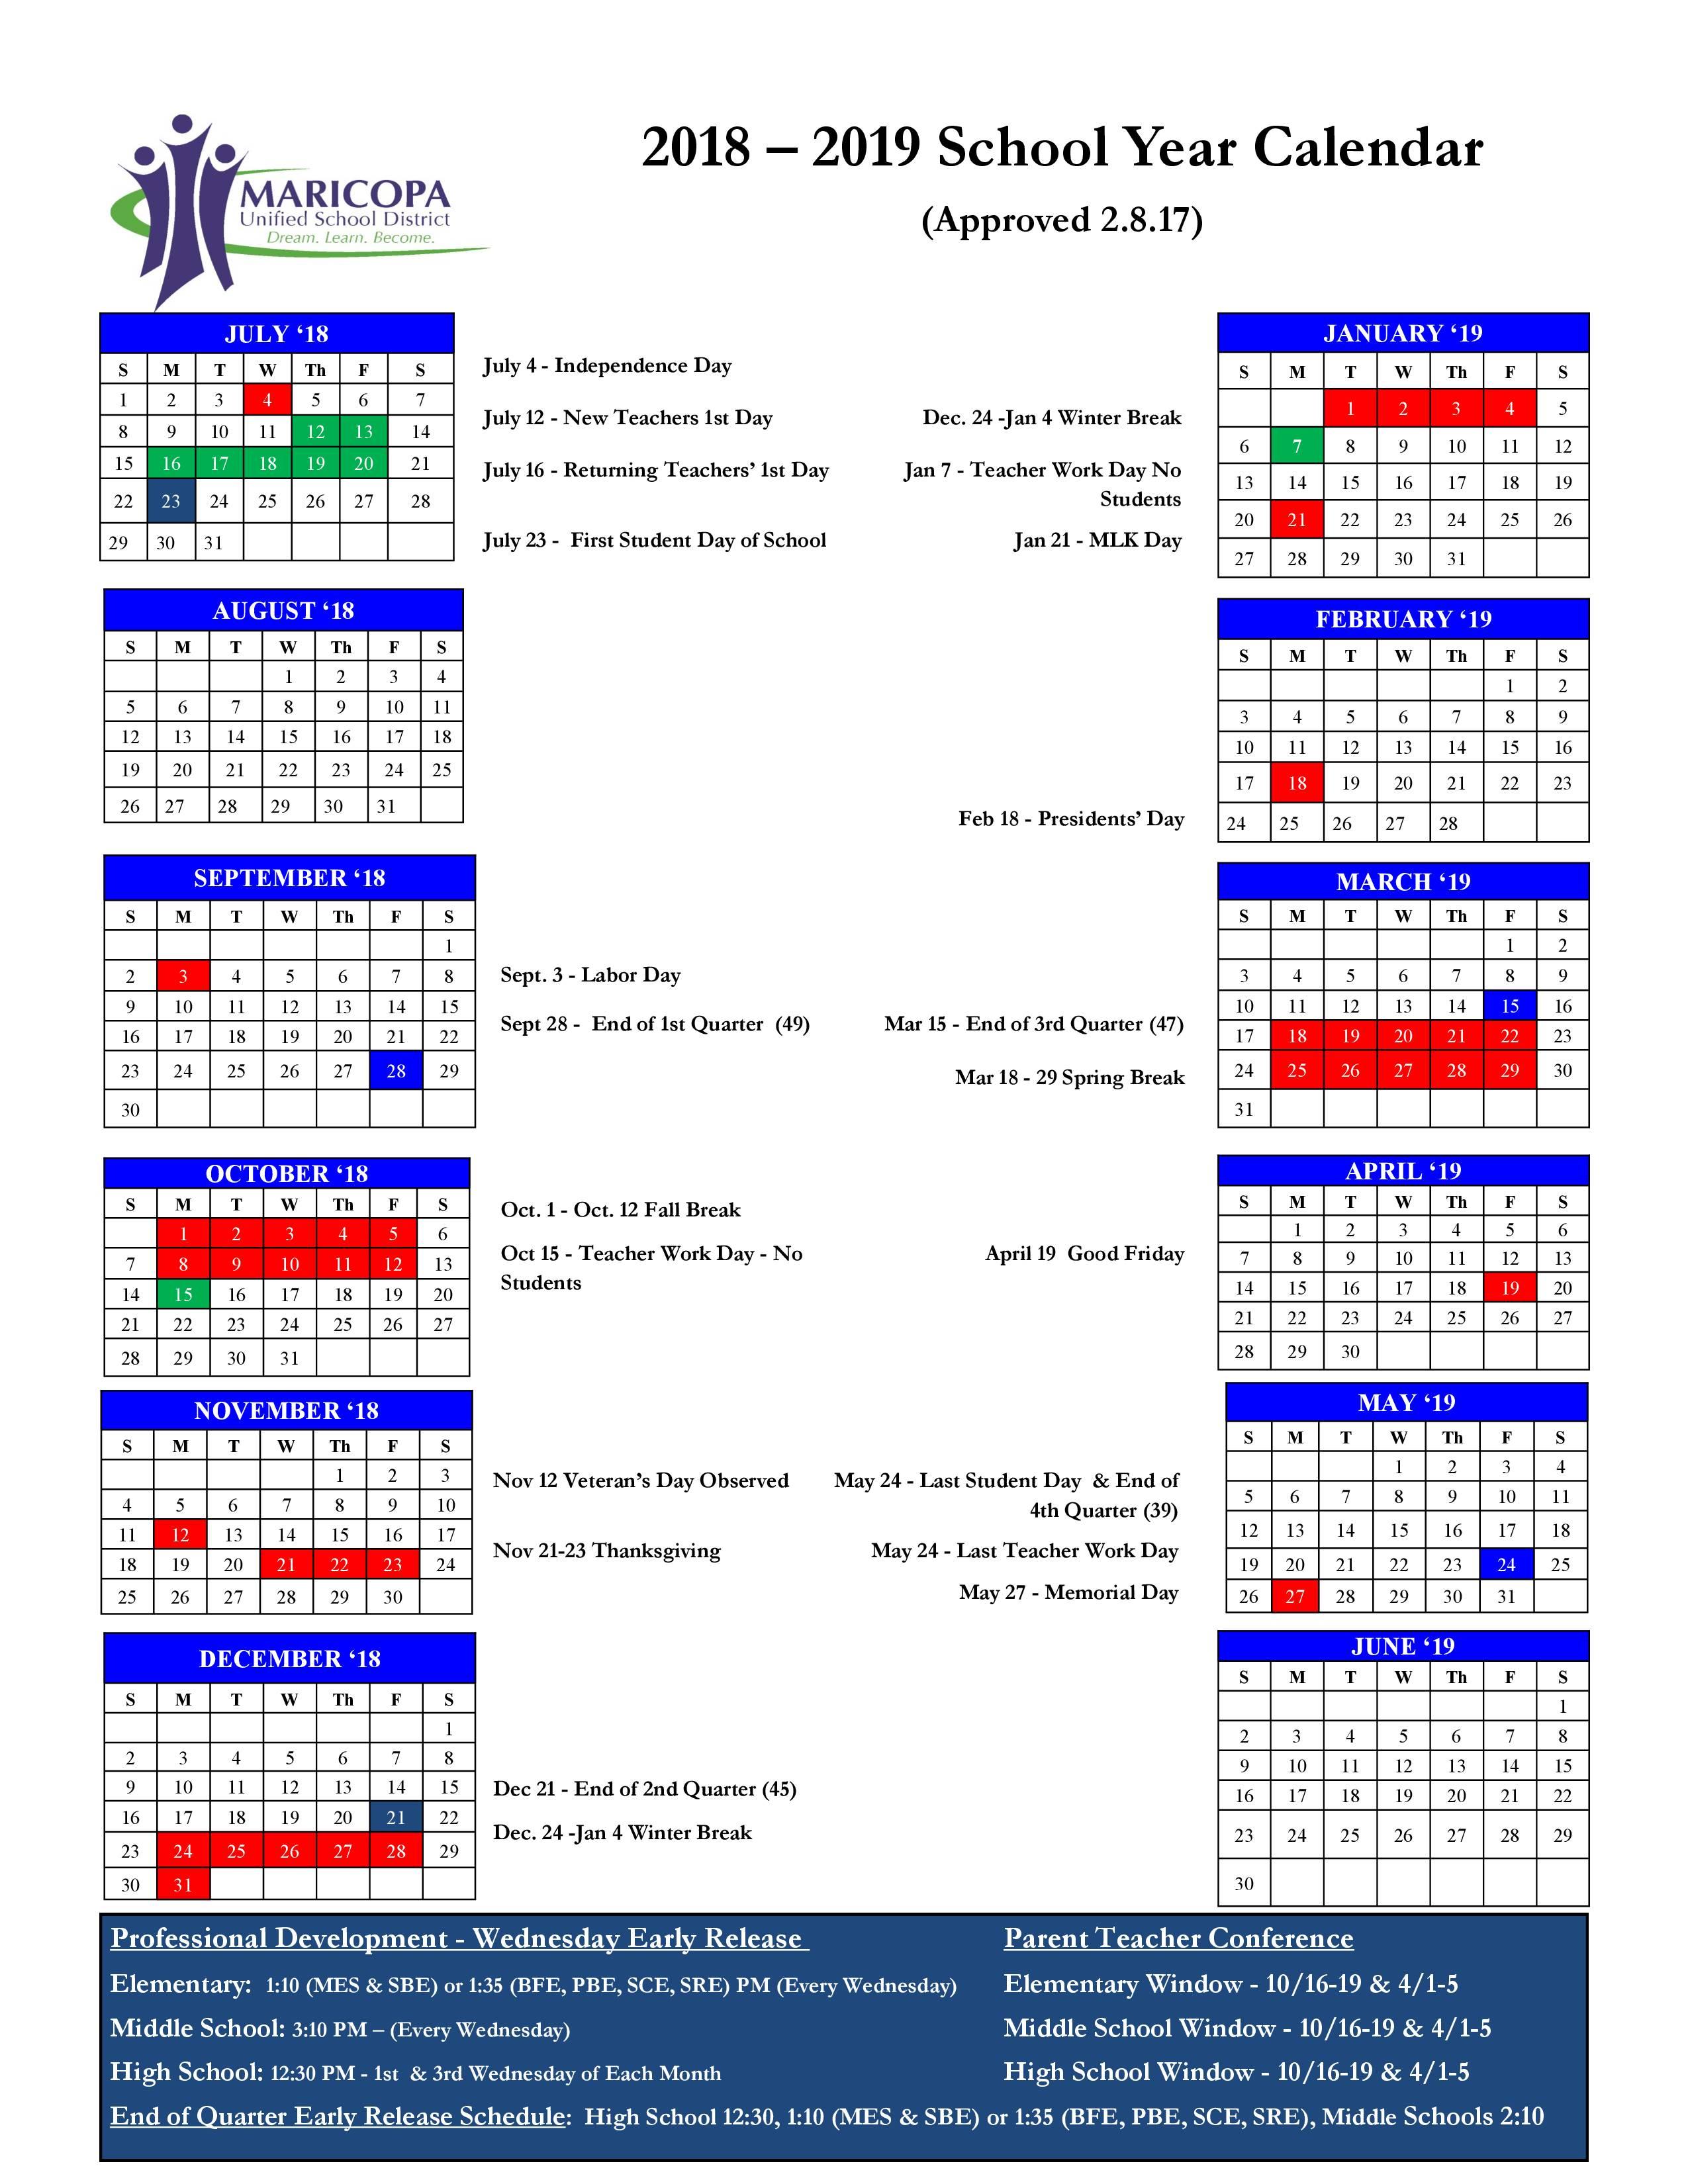 2018-19 Calendar